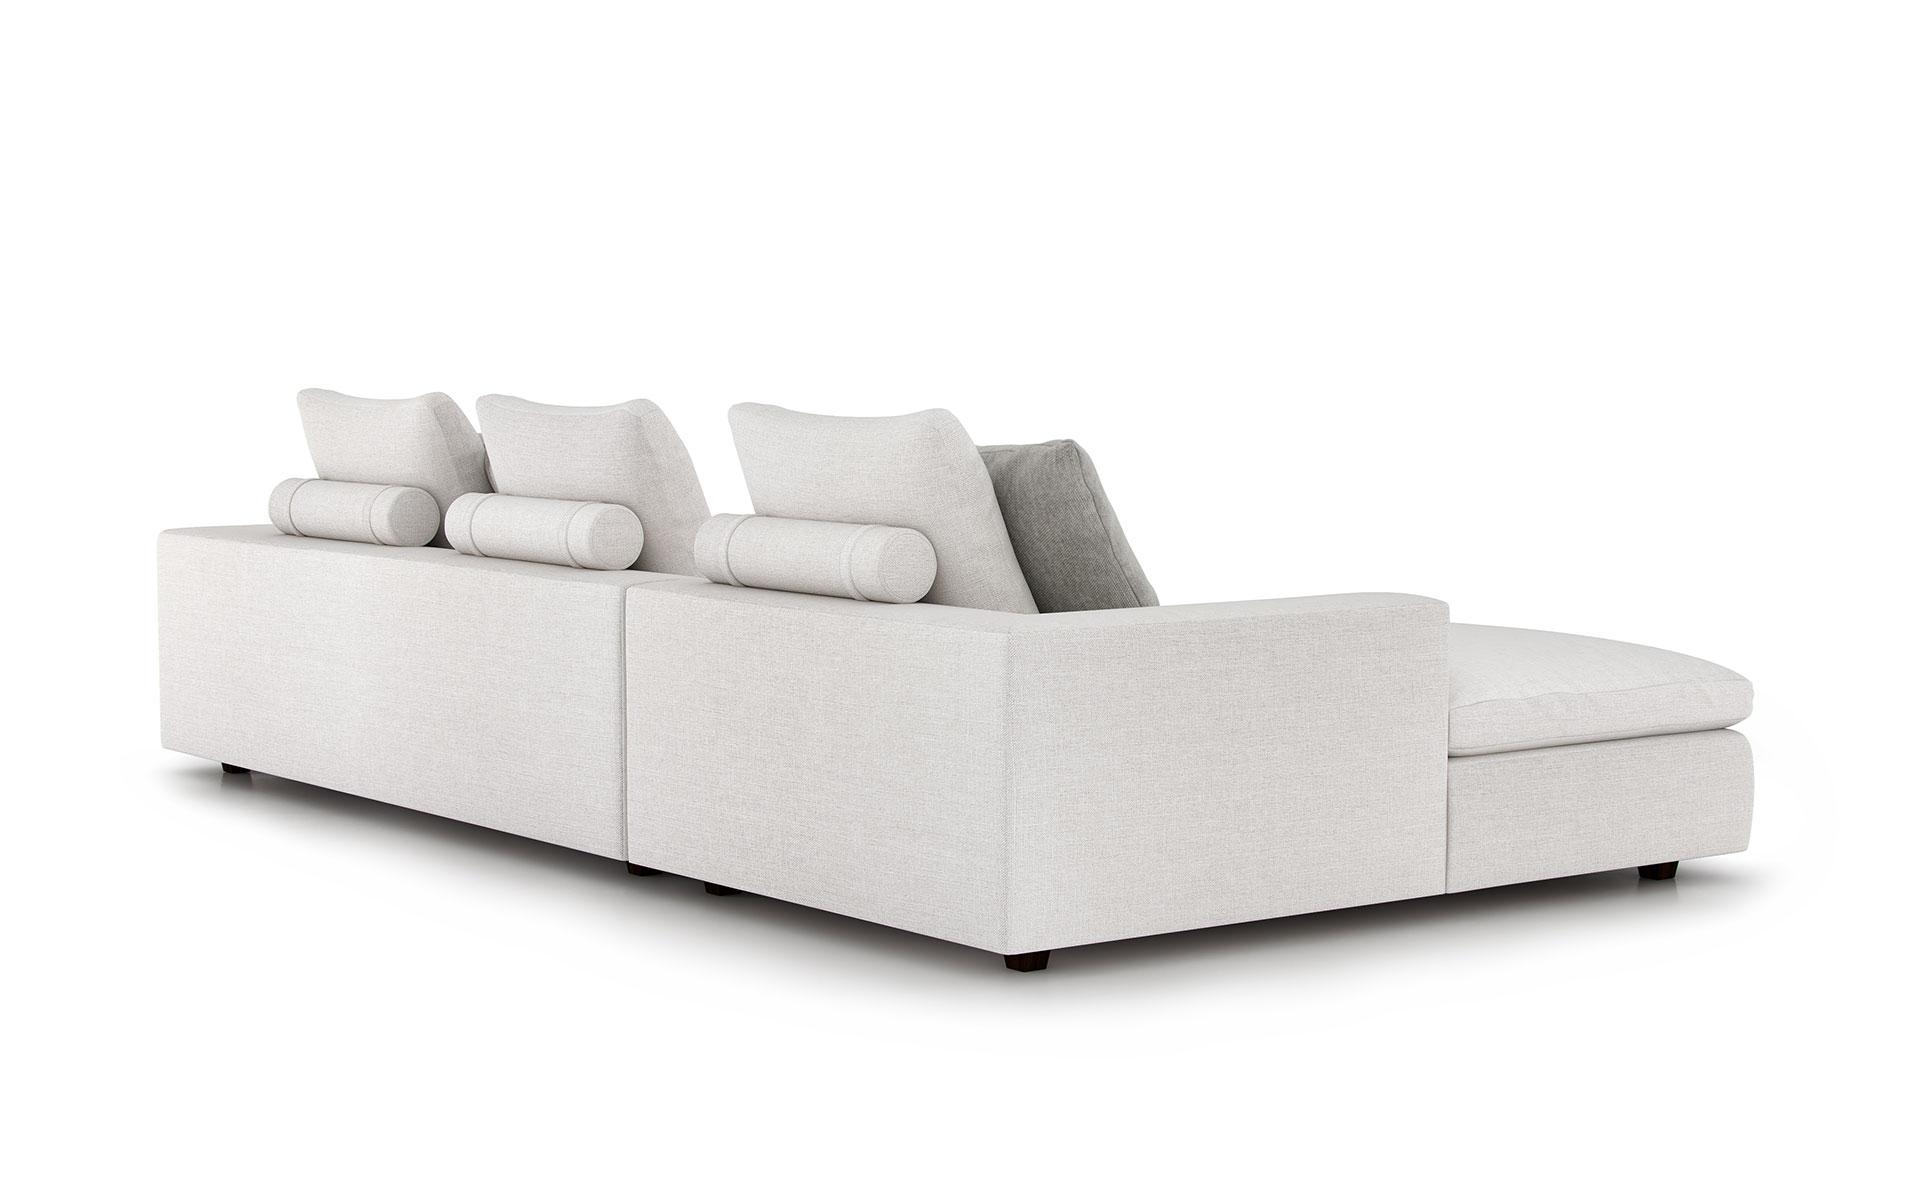 Lucerne Sectional Sofa